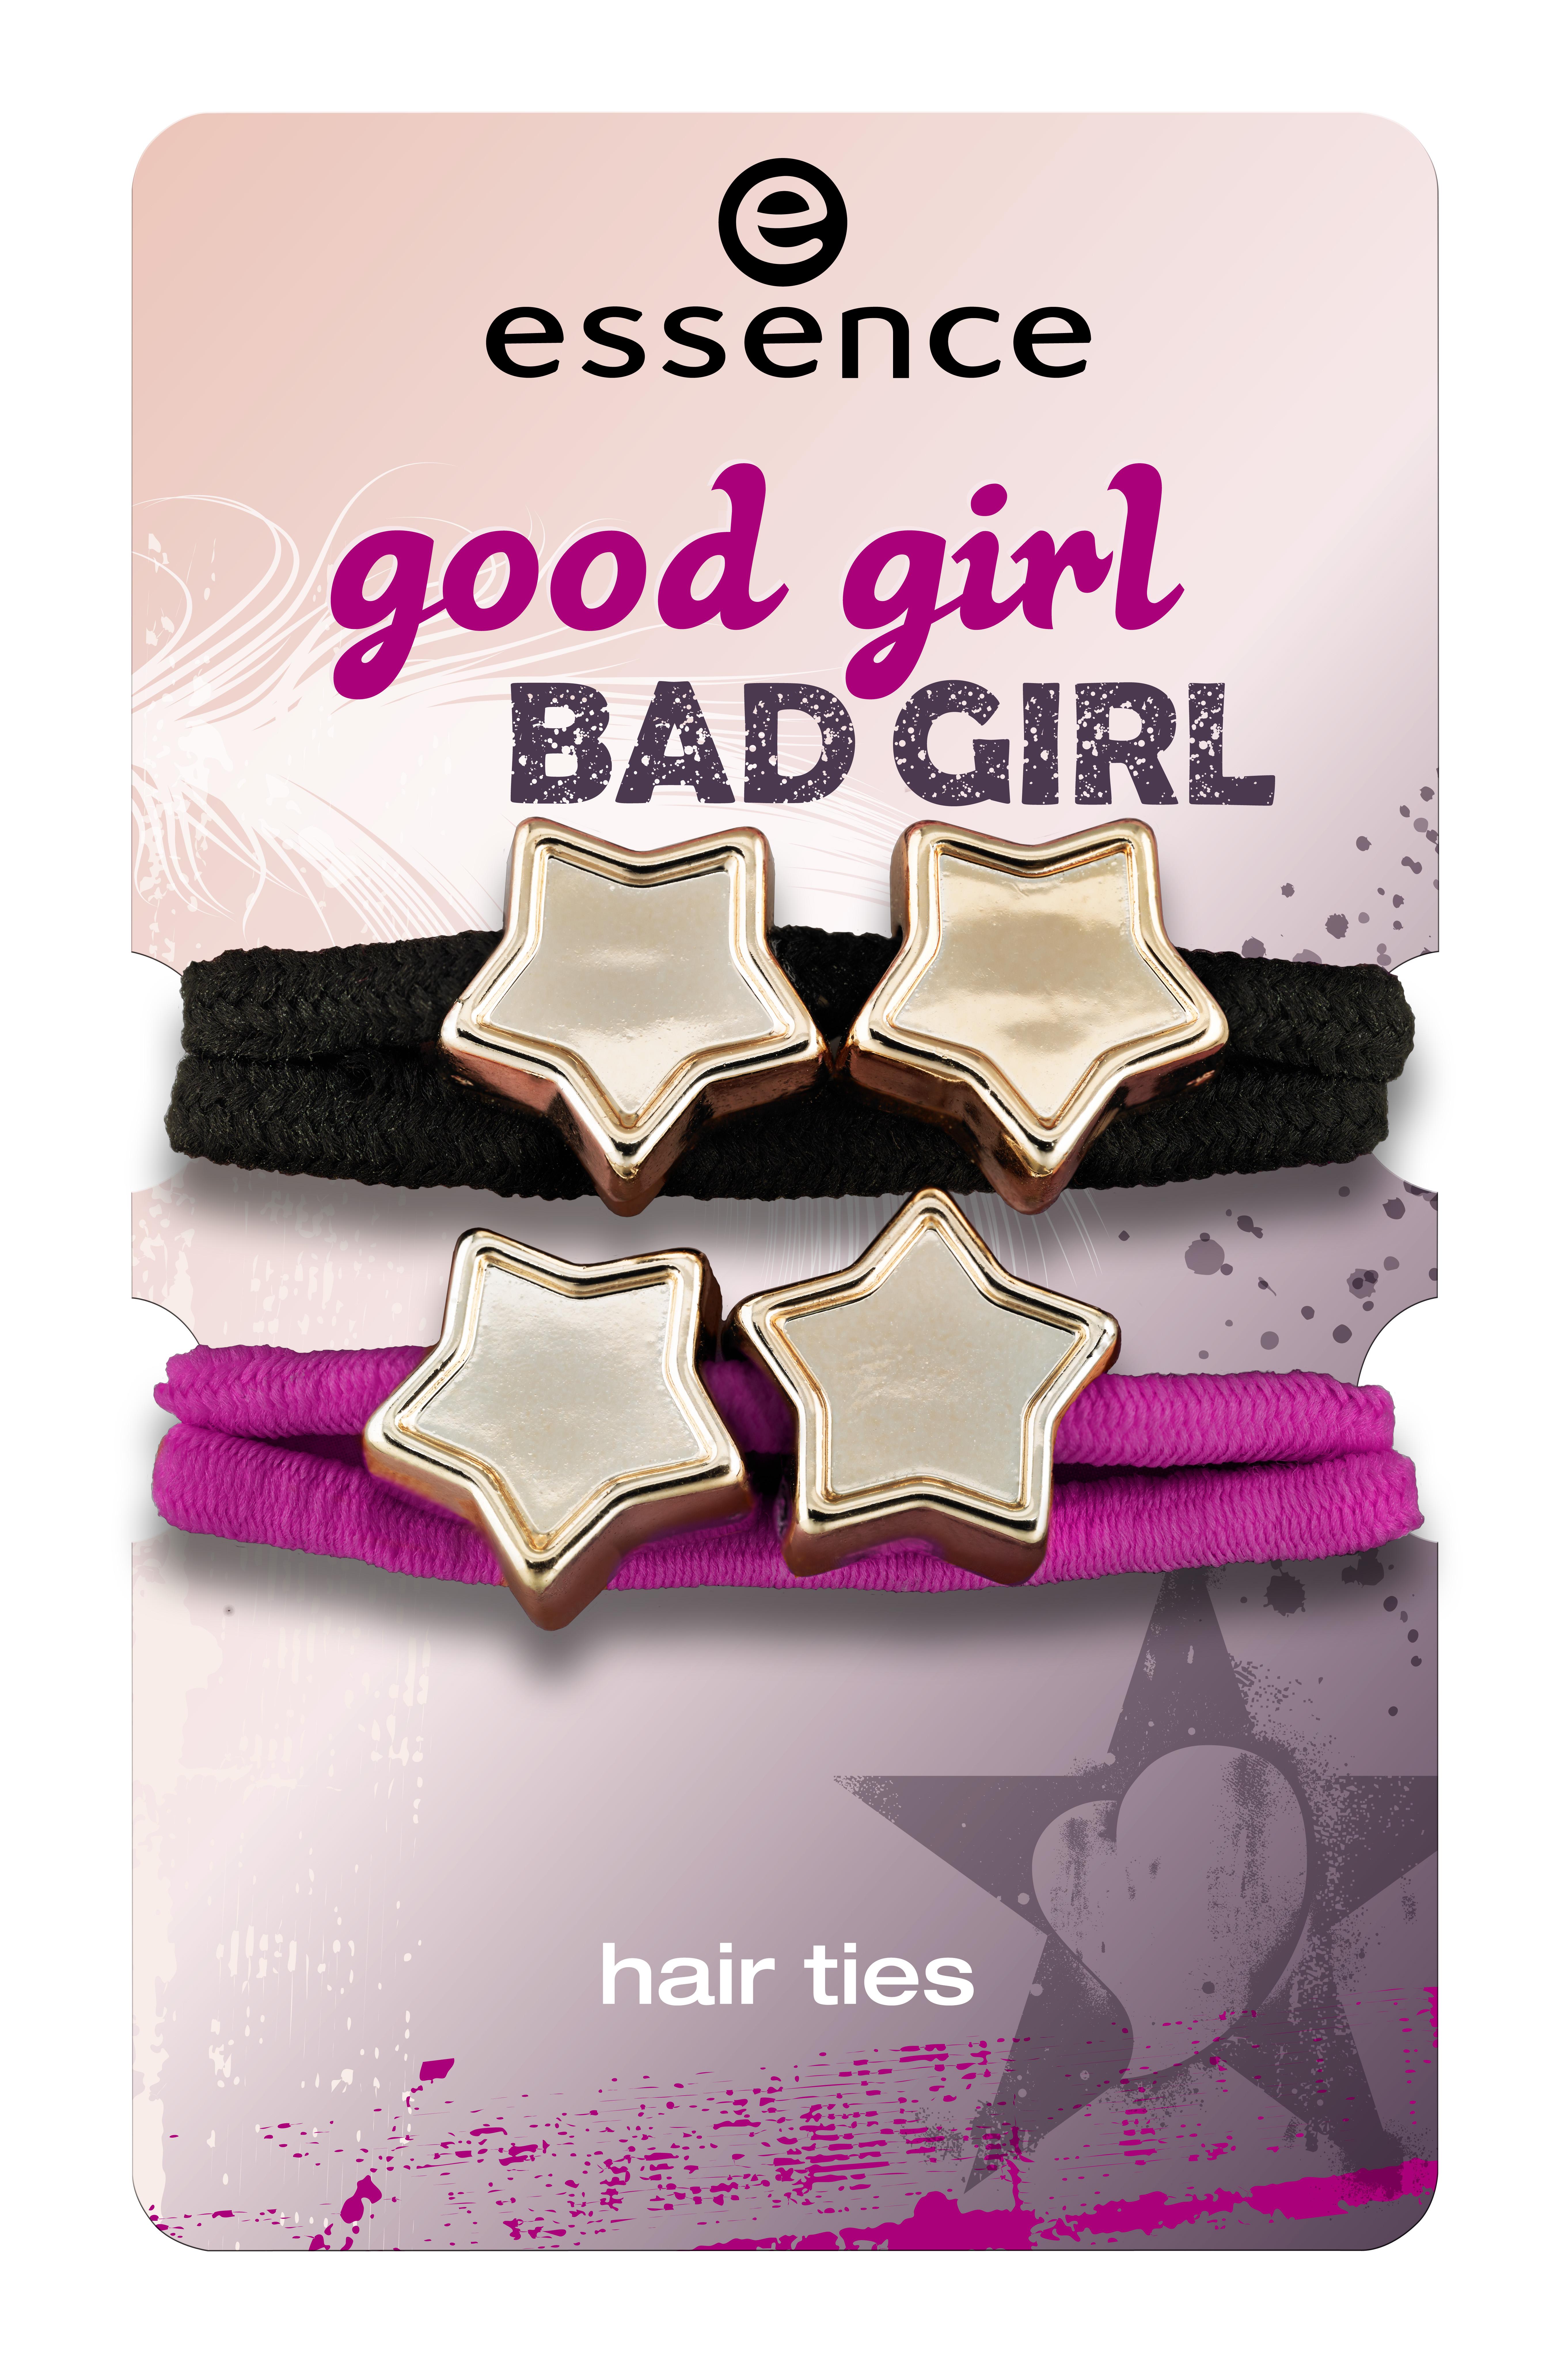 ess_goodgirl_badgirl_hairties_01.jpg